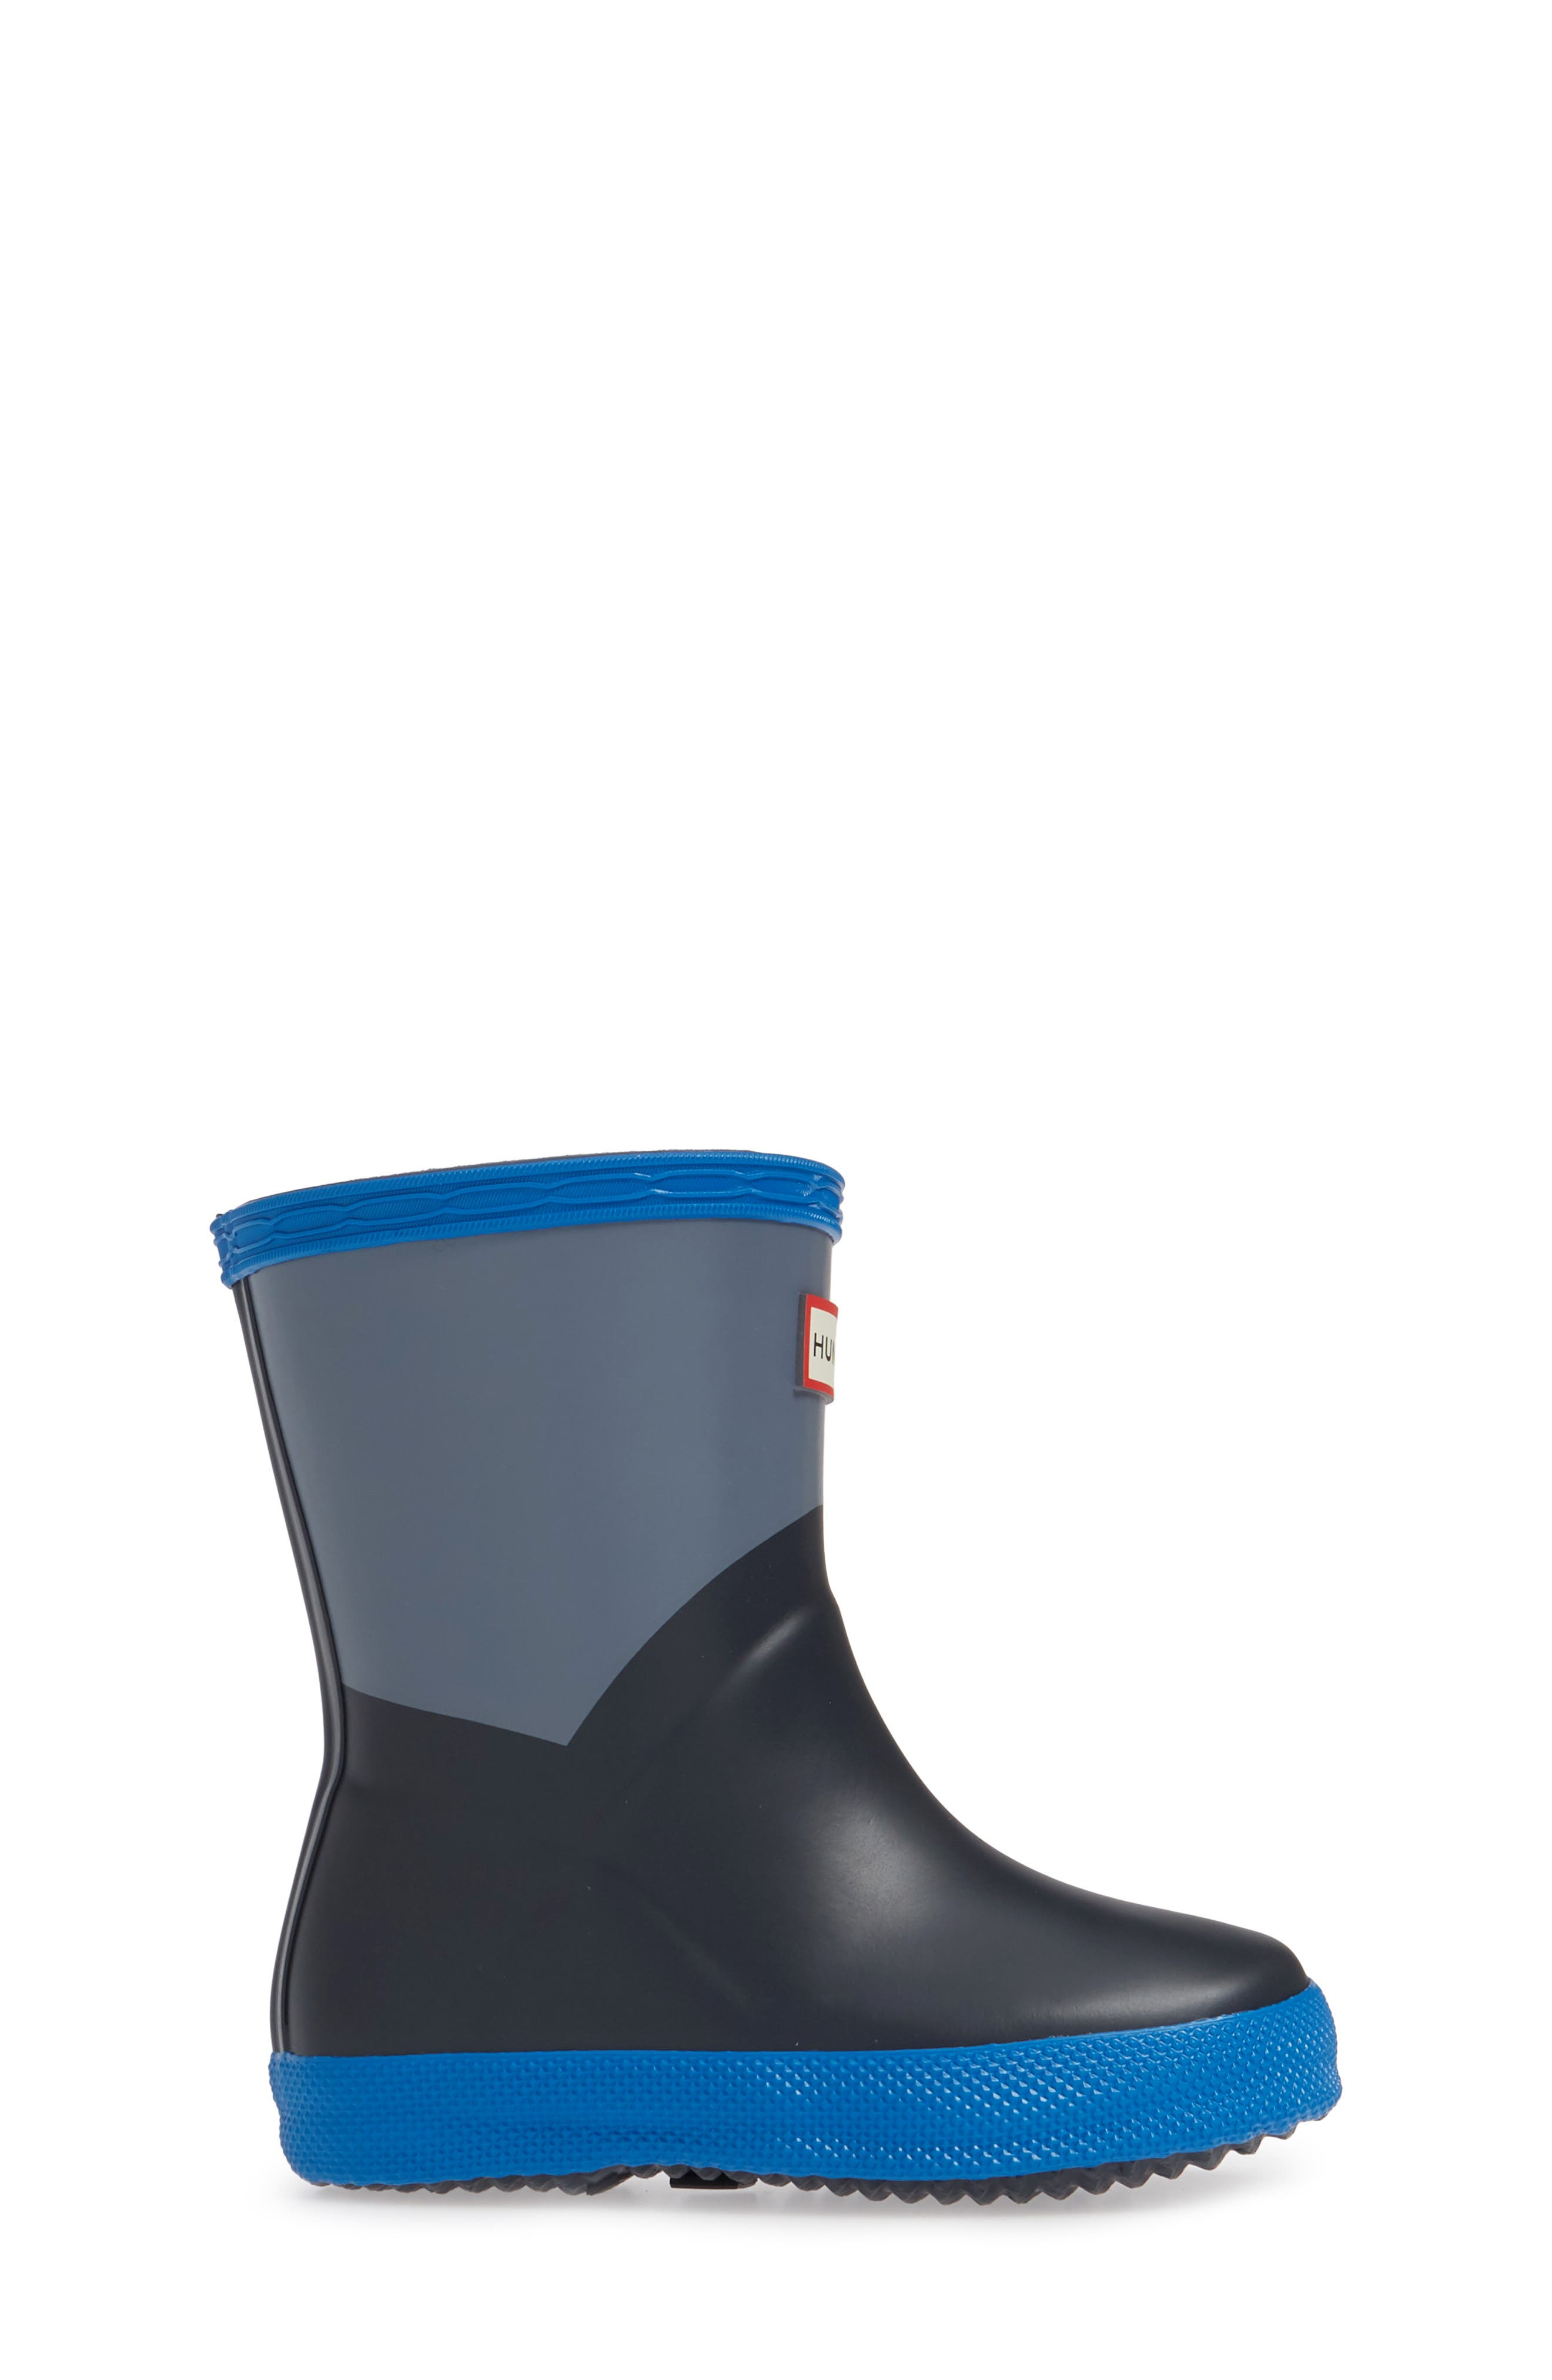 HUNTER,                             First Classic Waterproof Rain Boot,                             Alternate thumbnail 3, color,                             GULL GREY/ BUCKET BLUE/ NAVY